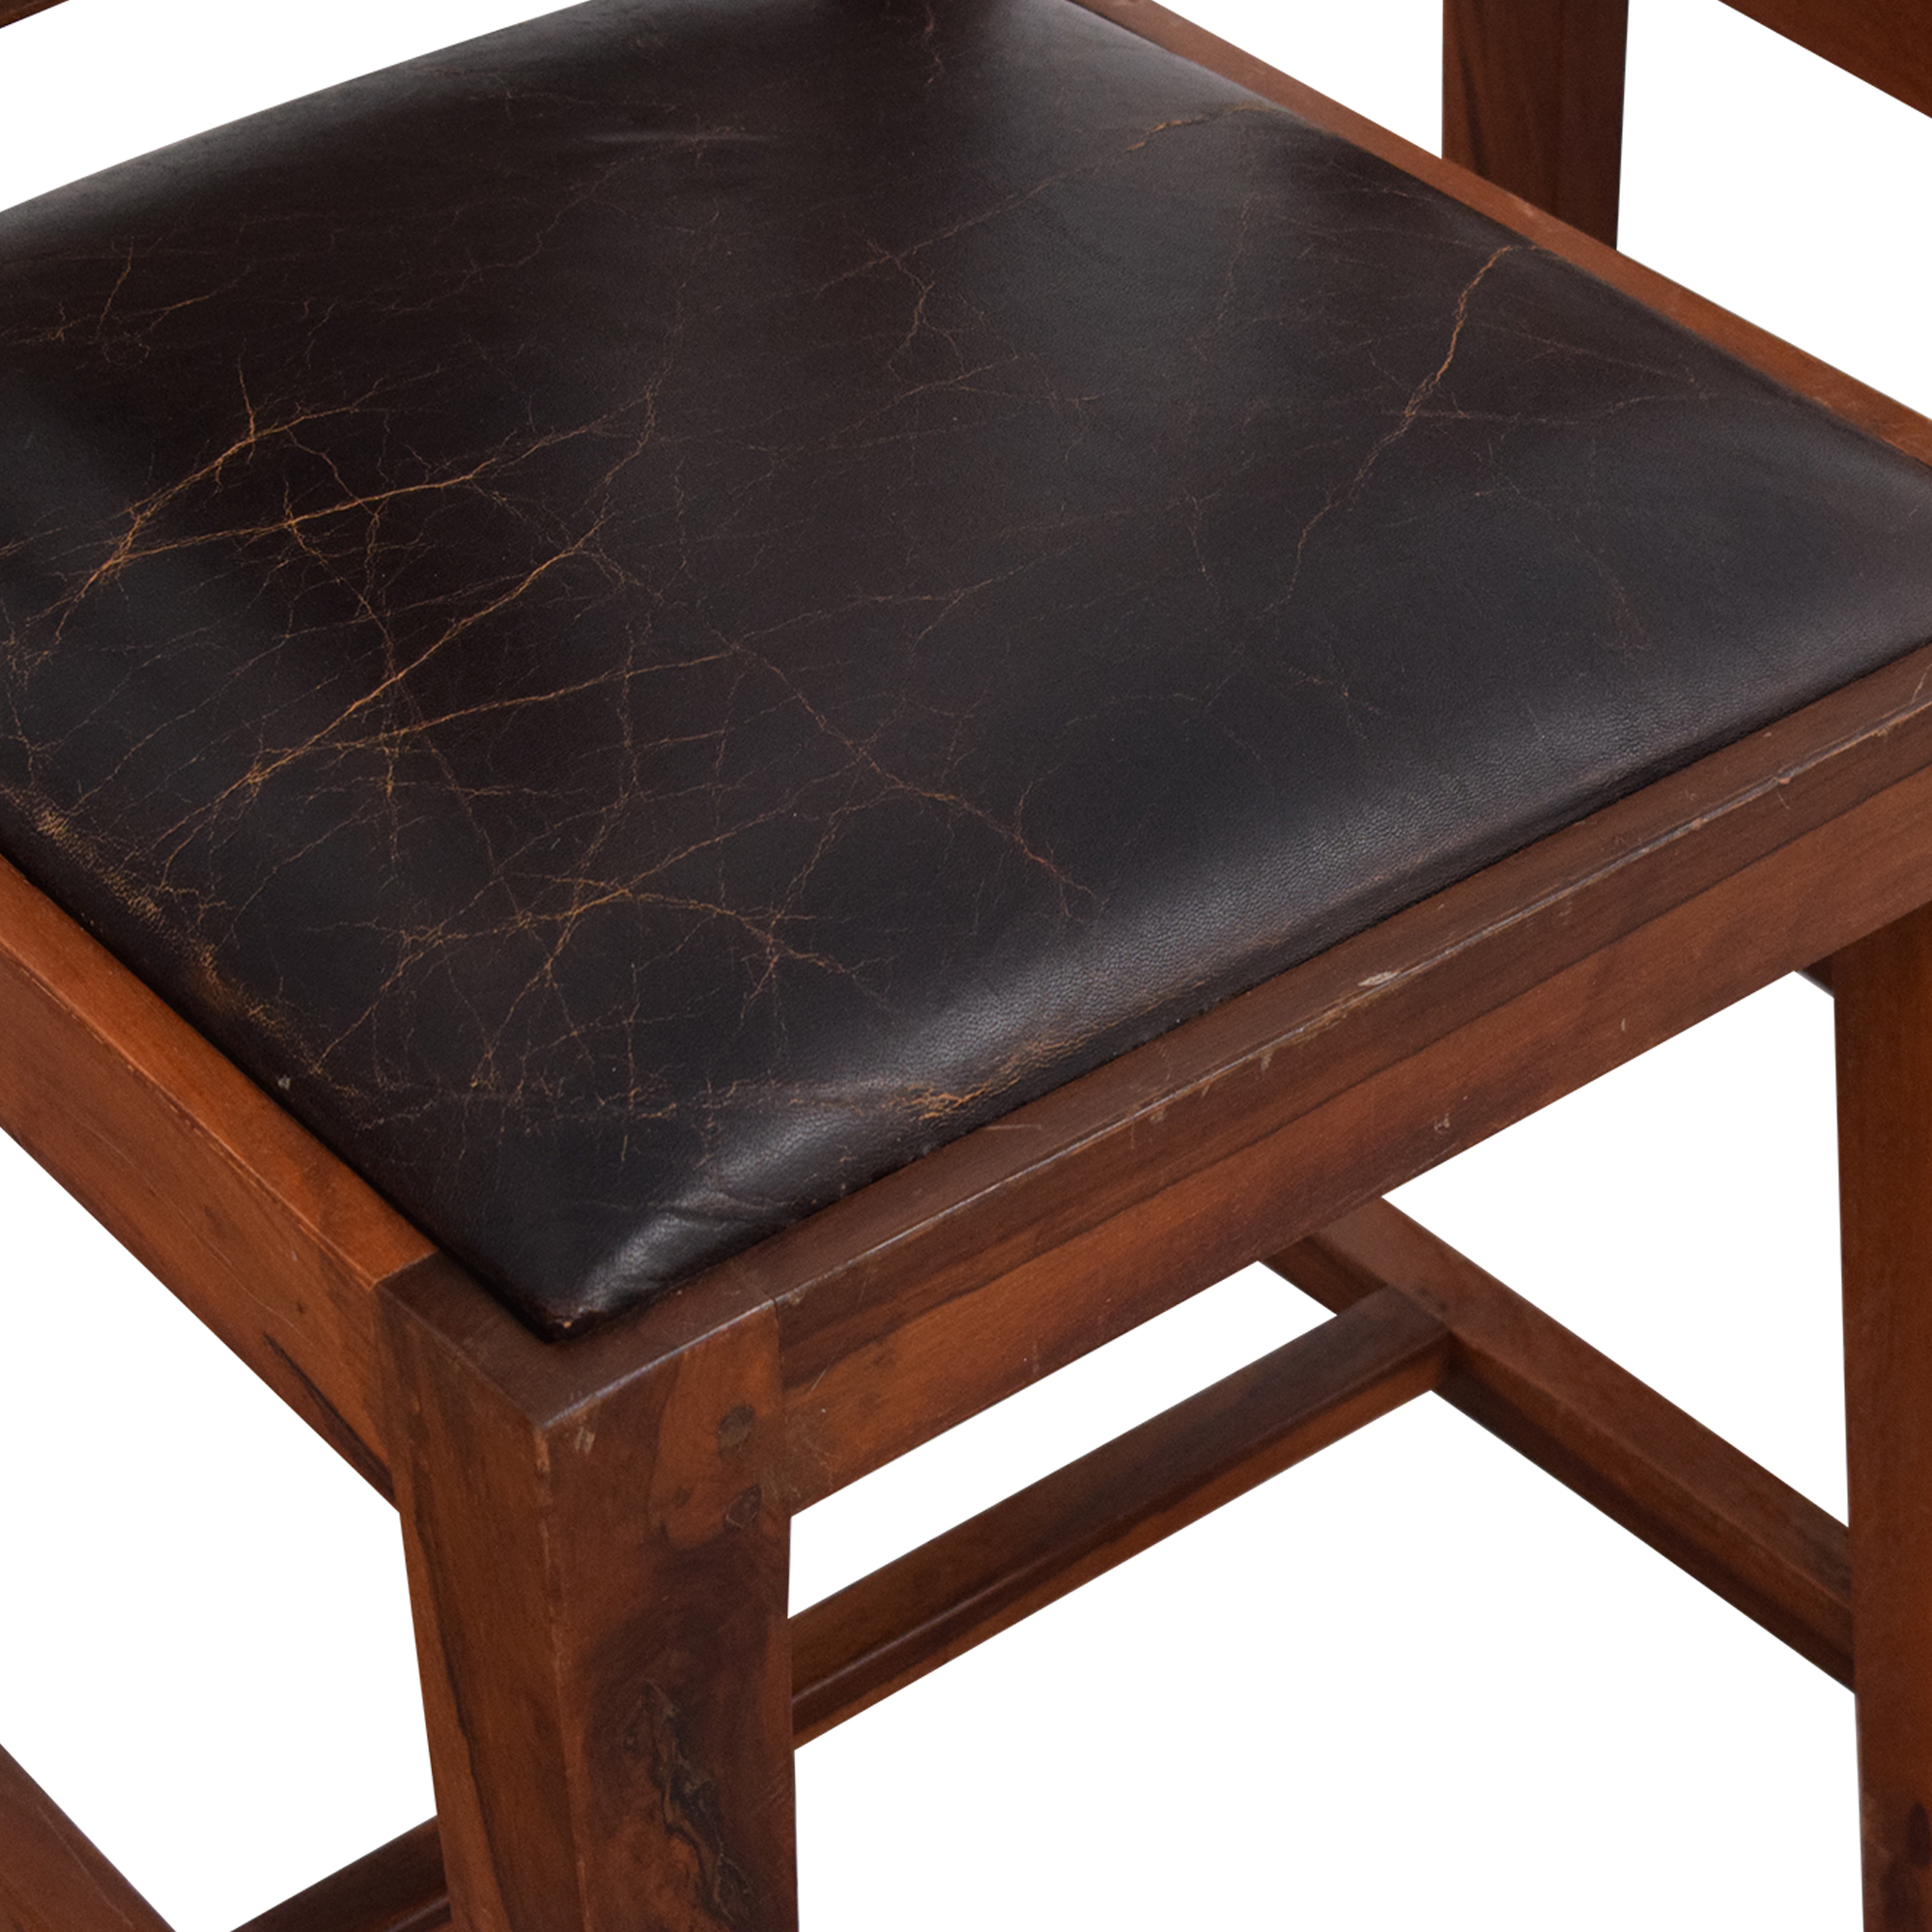 ABC Carpet & Home Dining Chairs ABC Carpet & Home